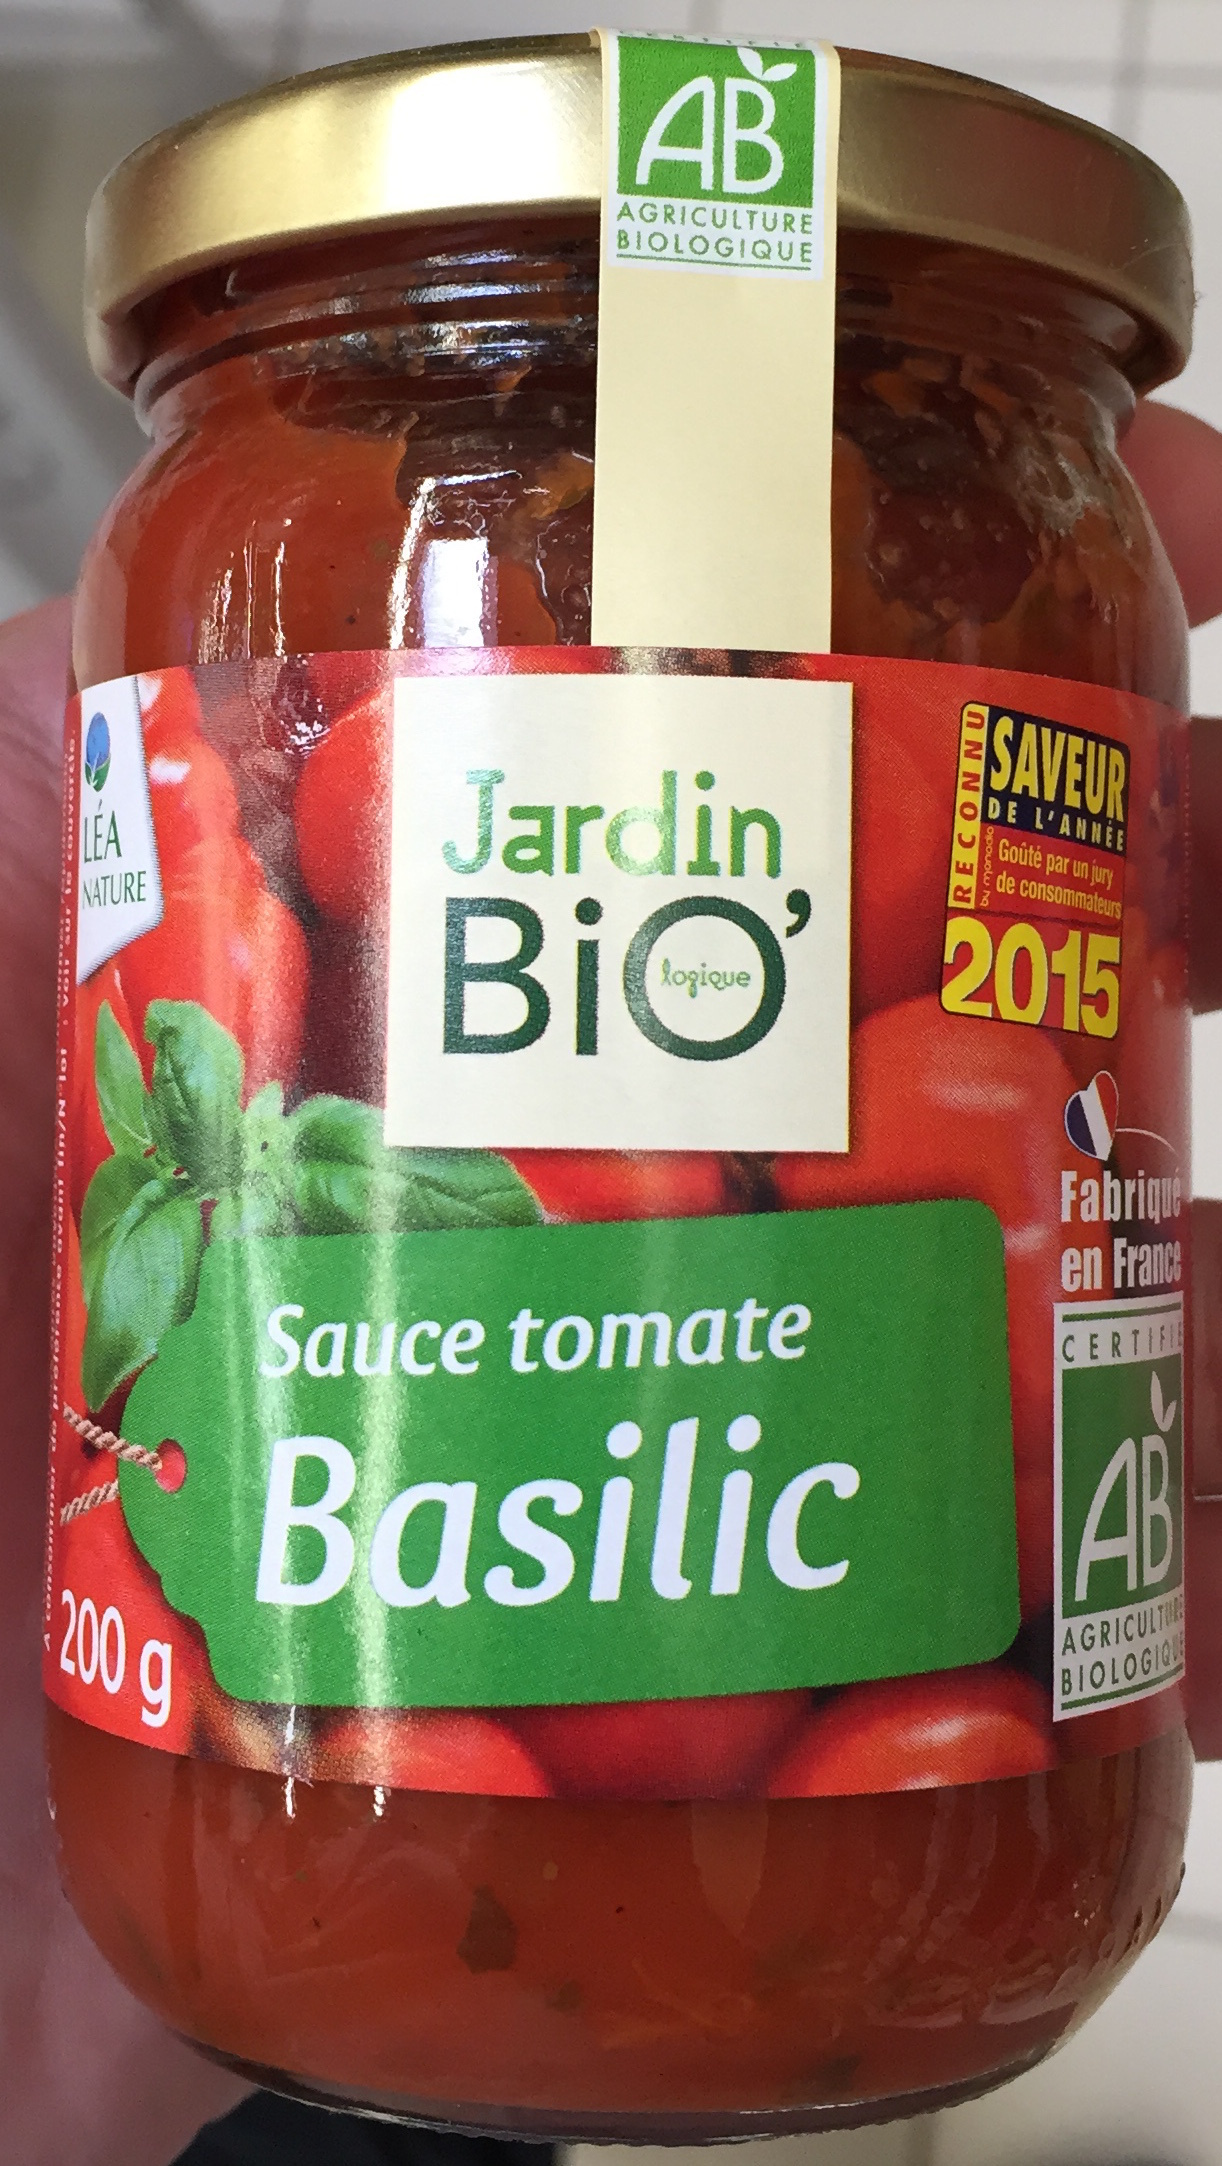 Sauce tomate Basilic Jardin BIO - Produit